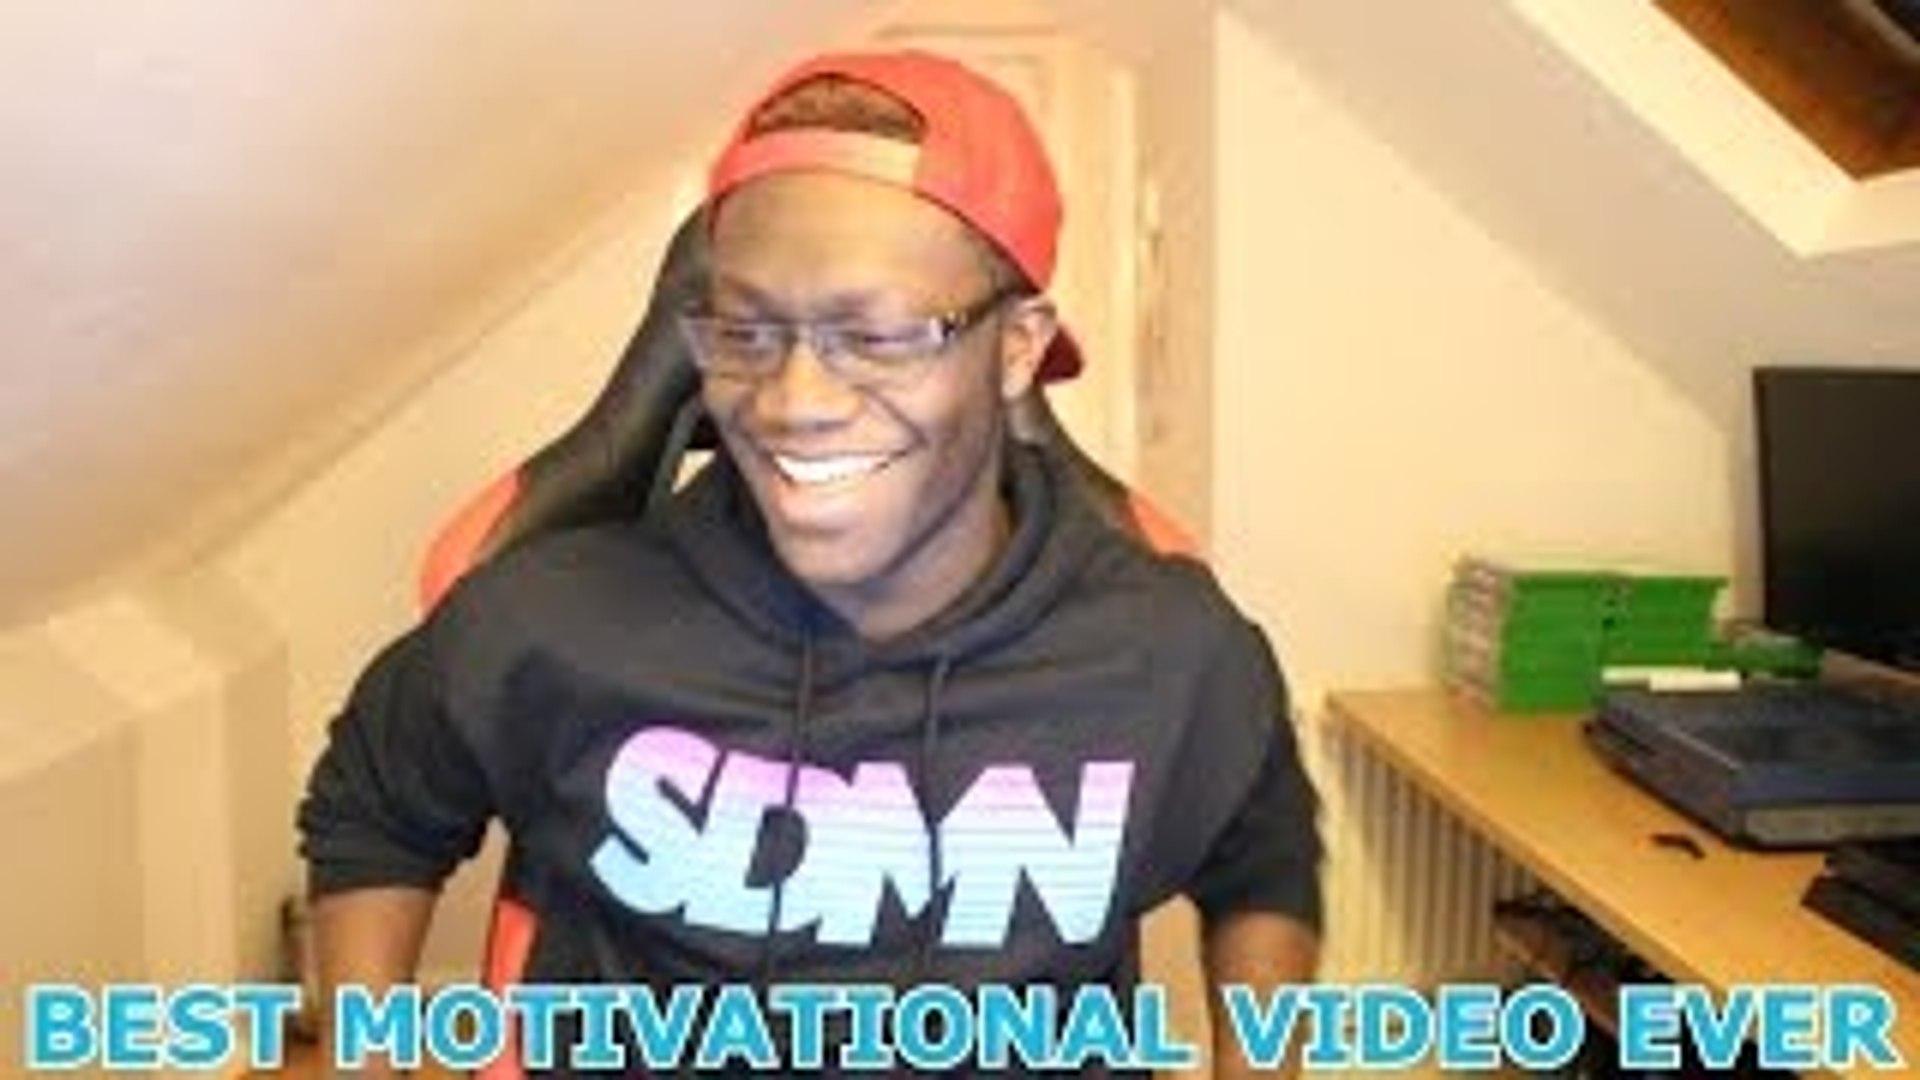 BEST MOTIVATIONAL VIDEO EVER